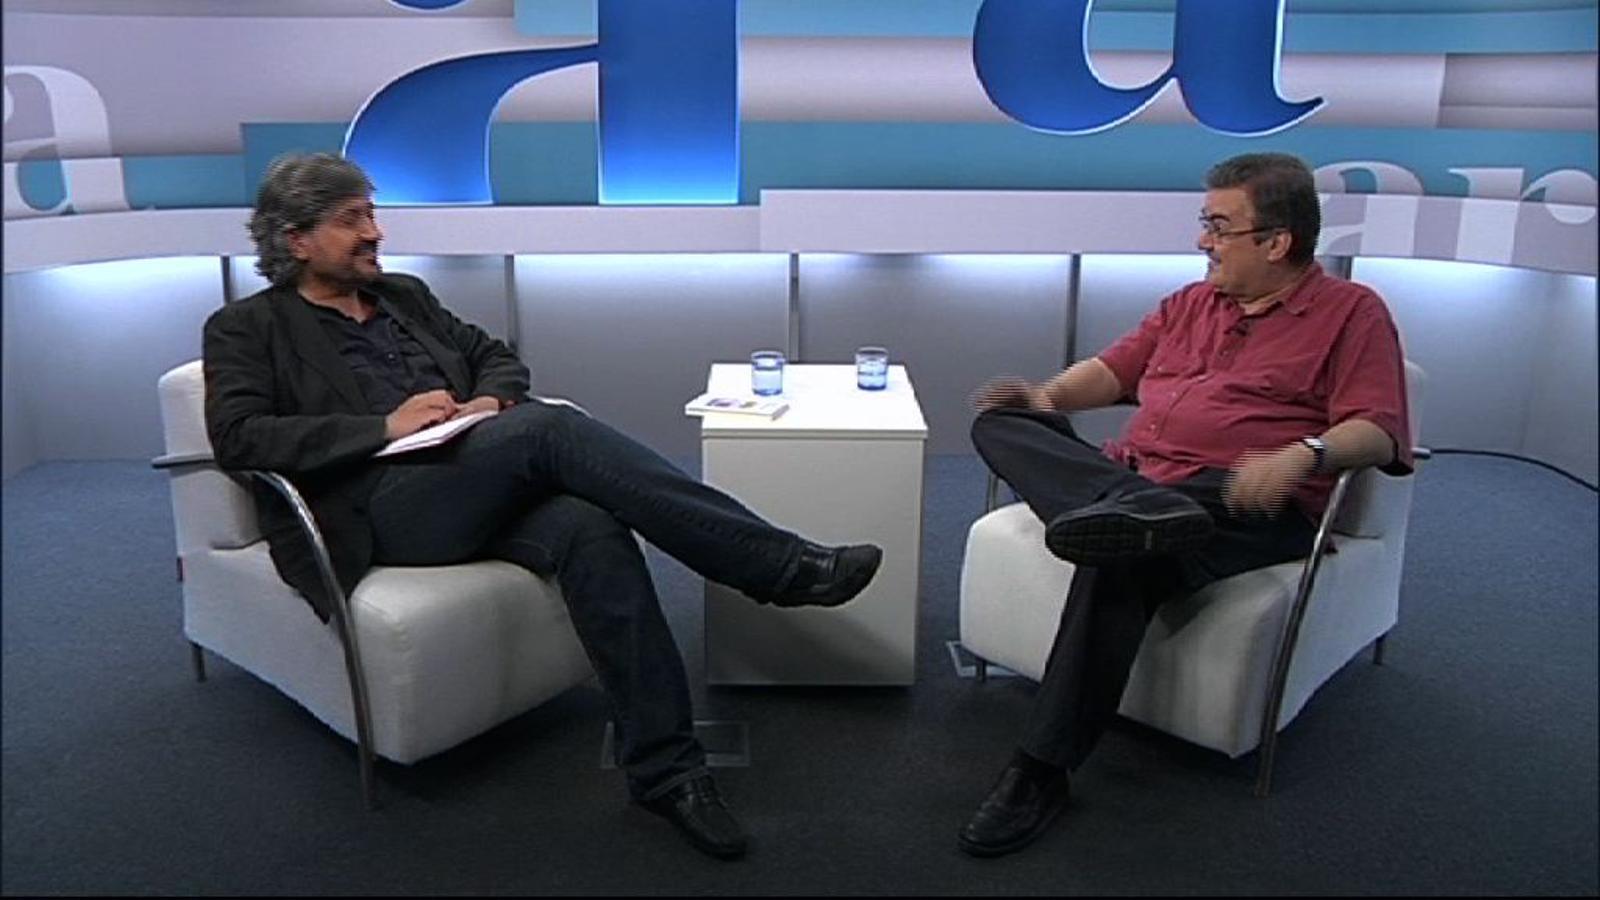 Entrevista de Carles Capdevila a Sergi Pàmies